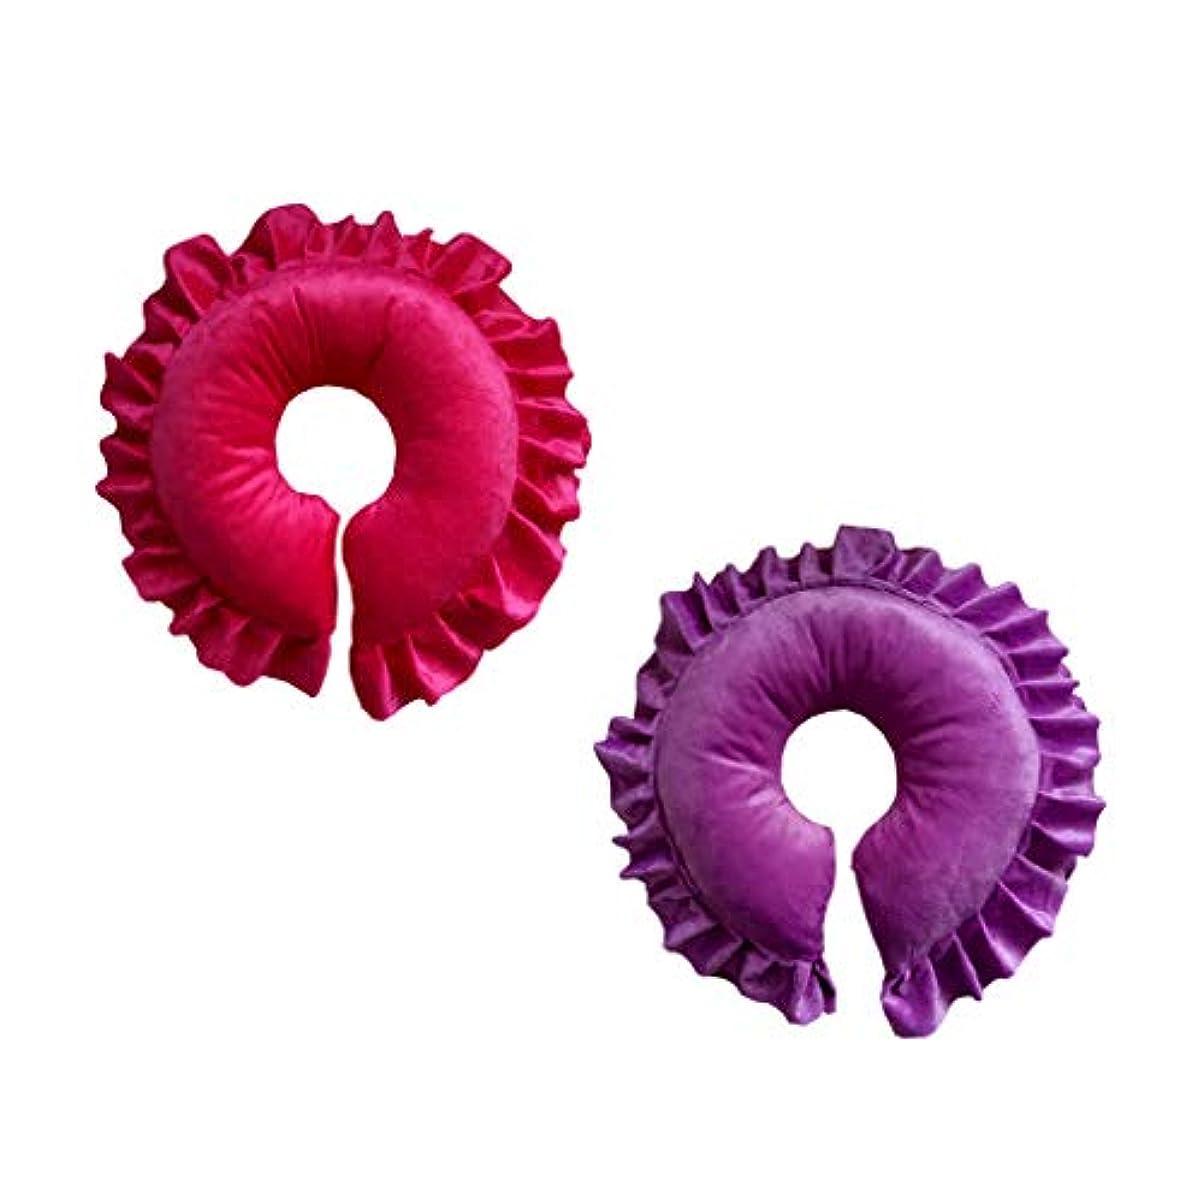 FLAMEER 2個 フェイスピロー マッサージ用クッション 顔枕 マッサージ枕 サロン スパ 快適 紫&赤